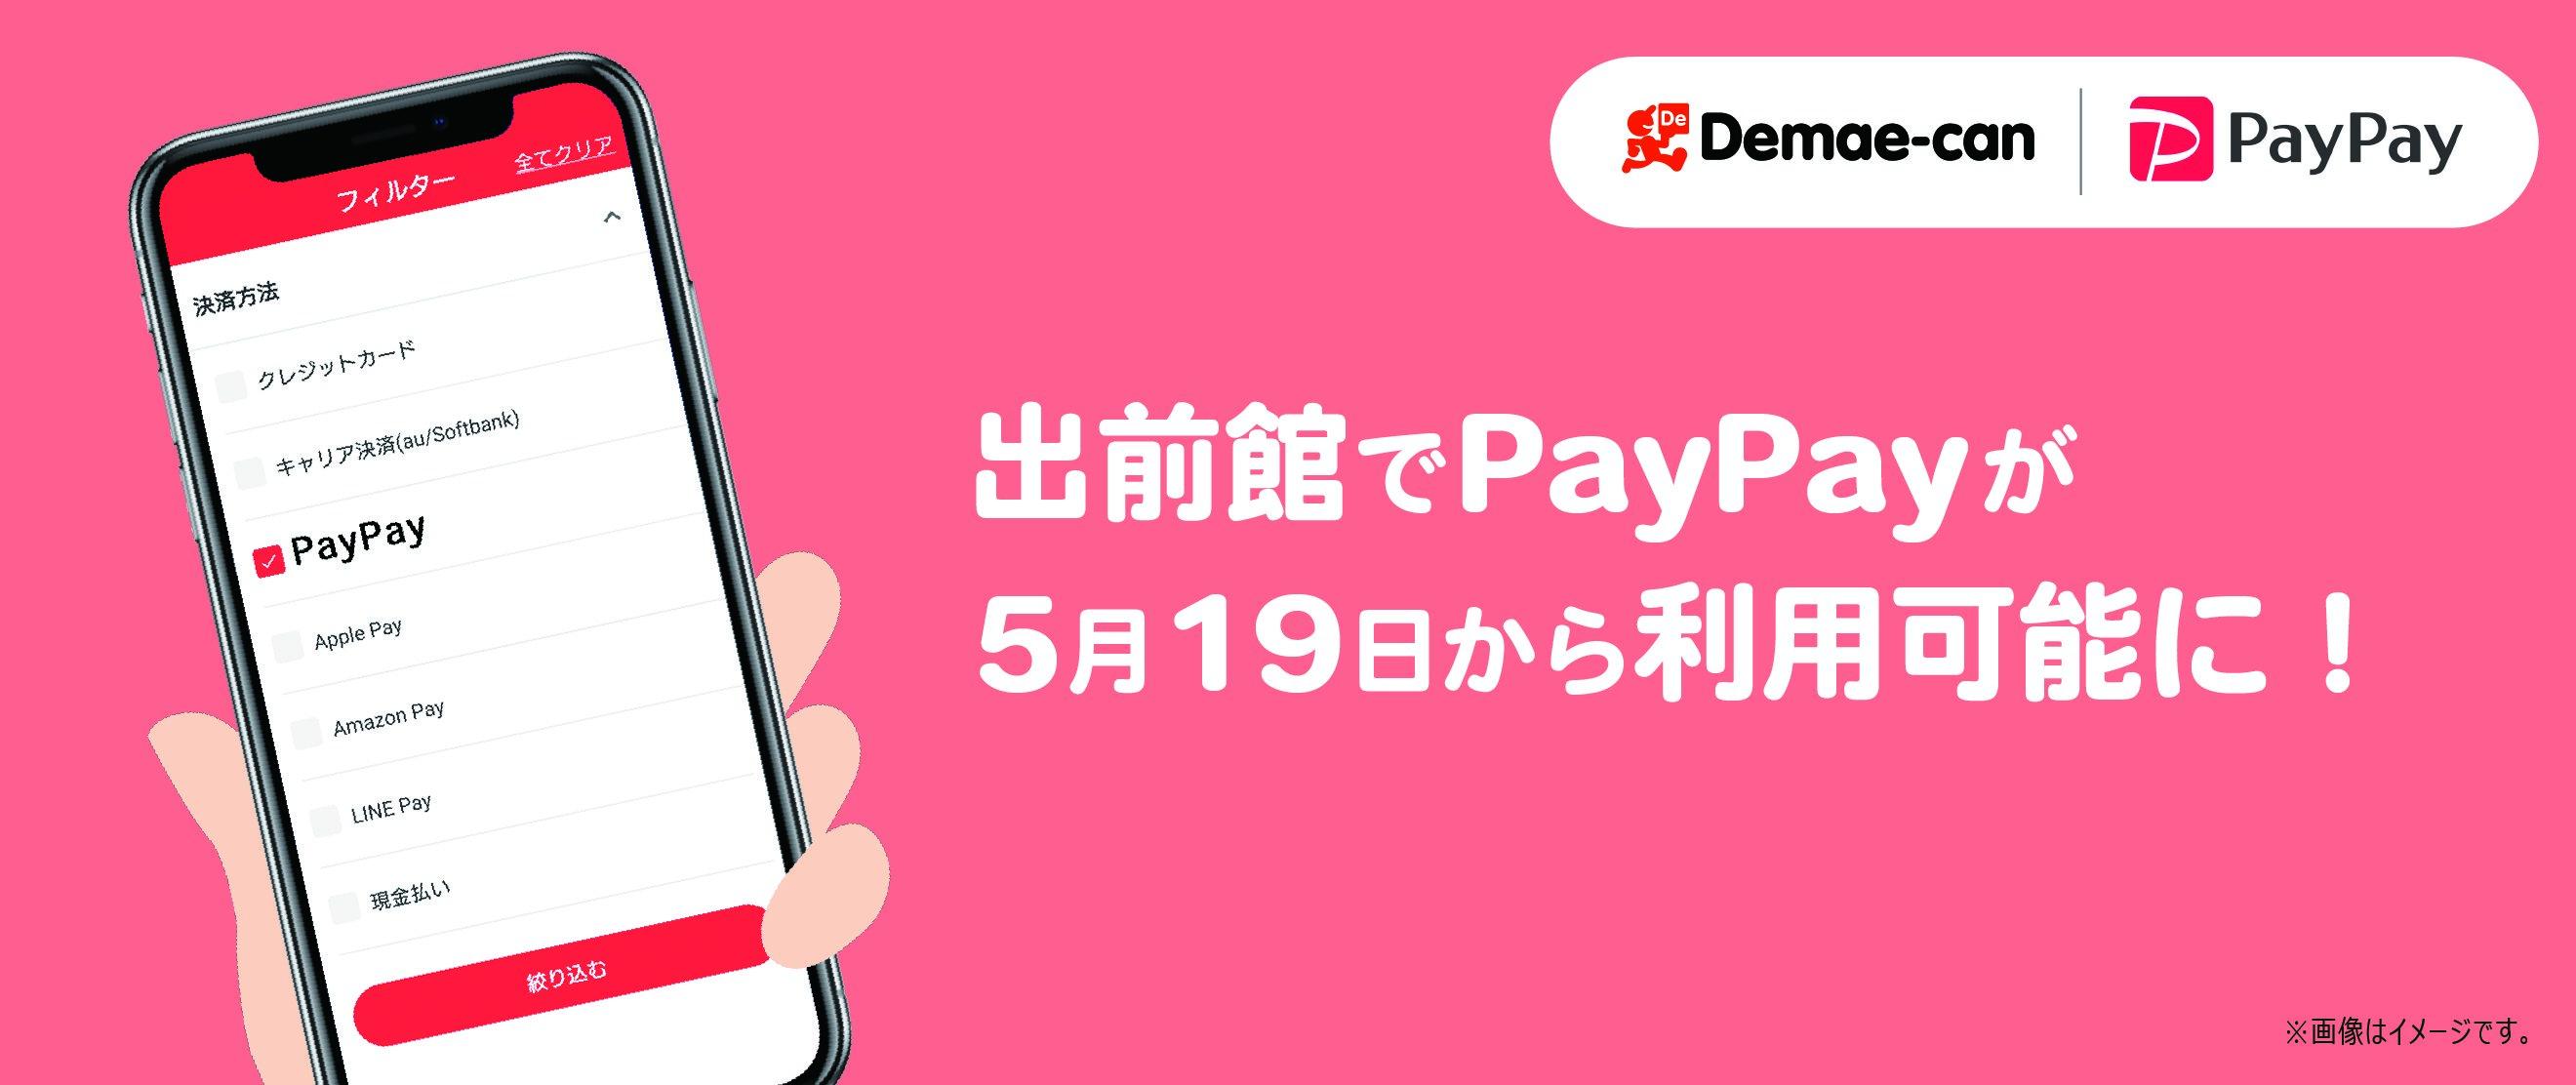 PayPay、出前館での支払いに対応。おトクなキャンペーンも